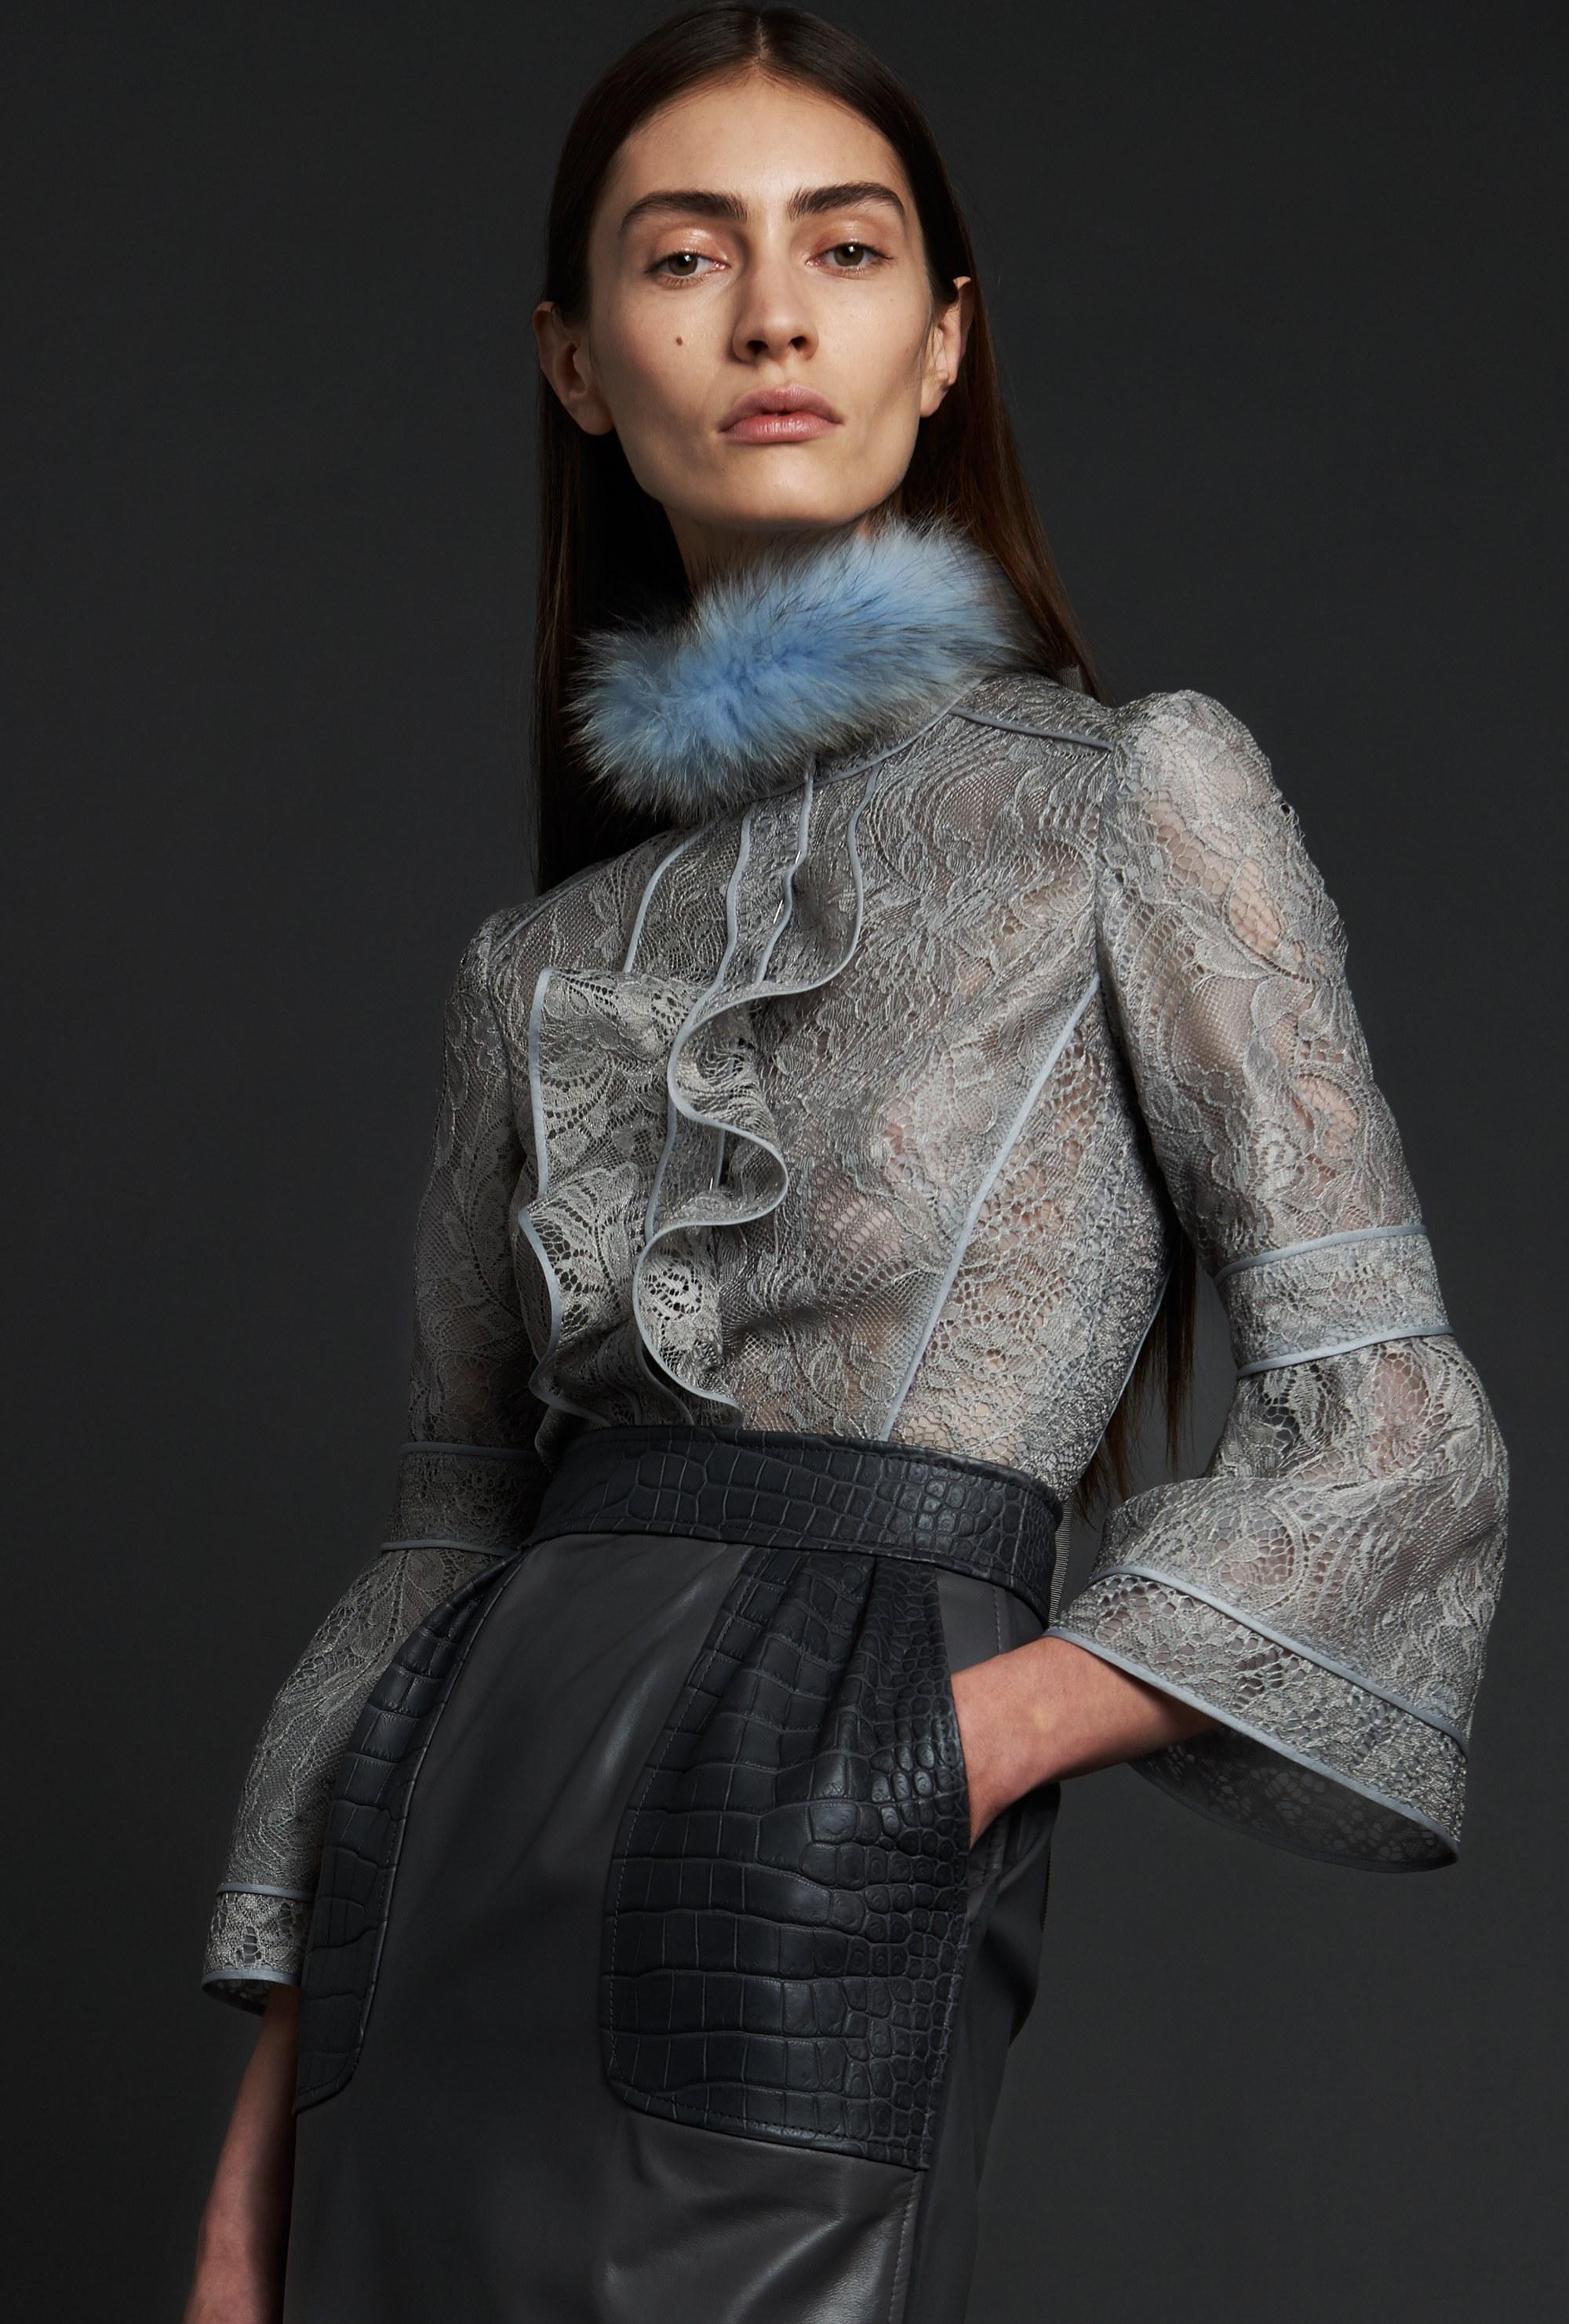 j-mendel-pre-fall-2017-fashion-show-the-impression-10